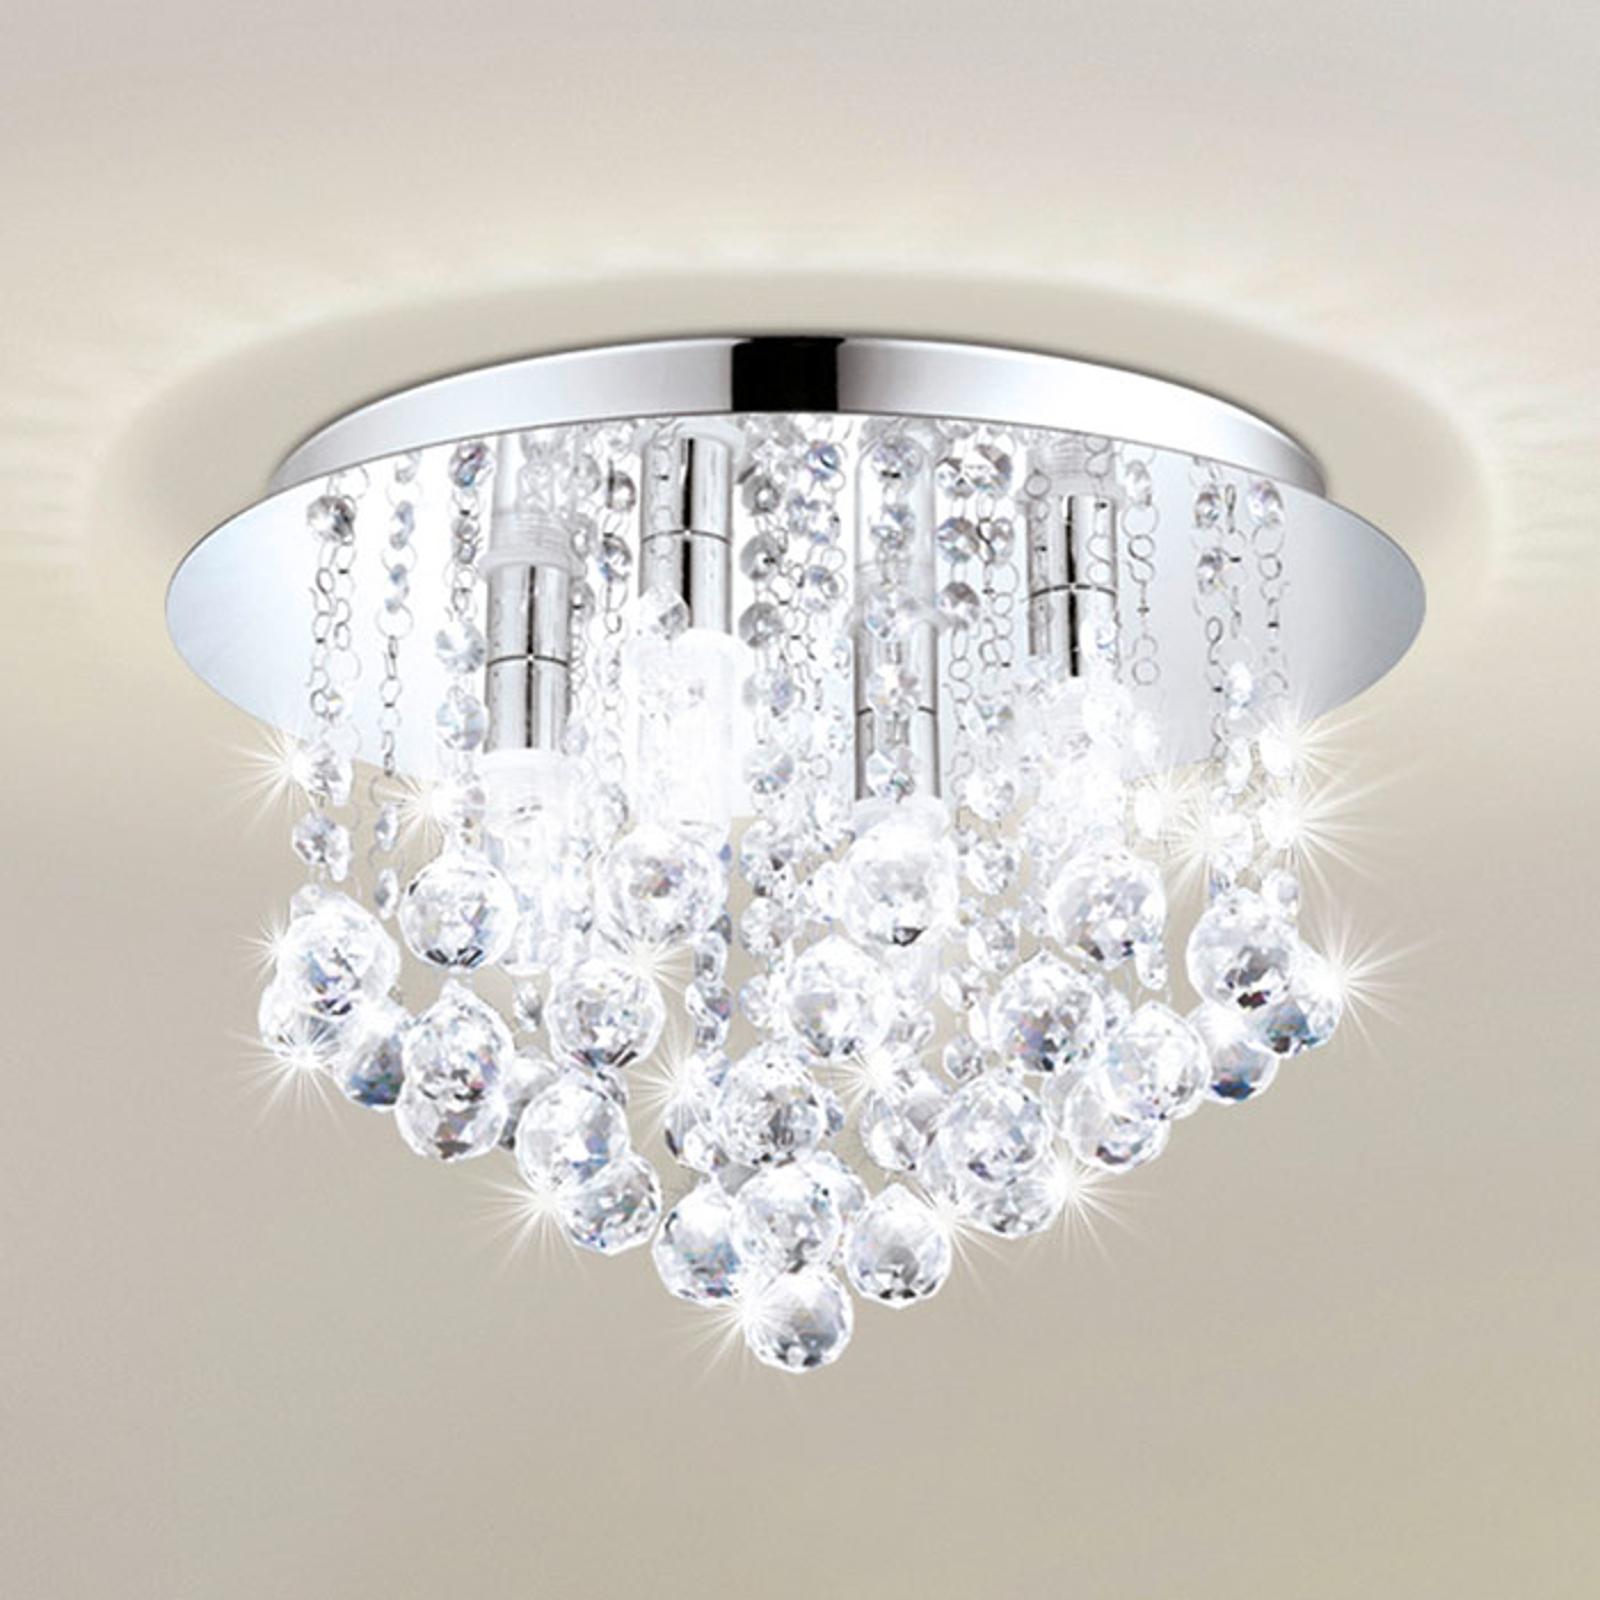 Lampa sufitowa LED Almonte z ozdobami, 35cm